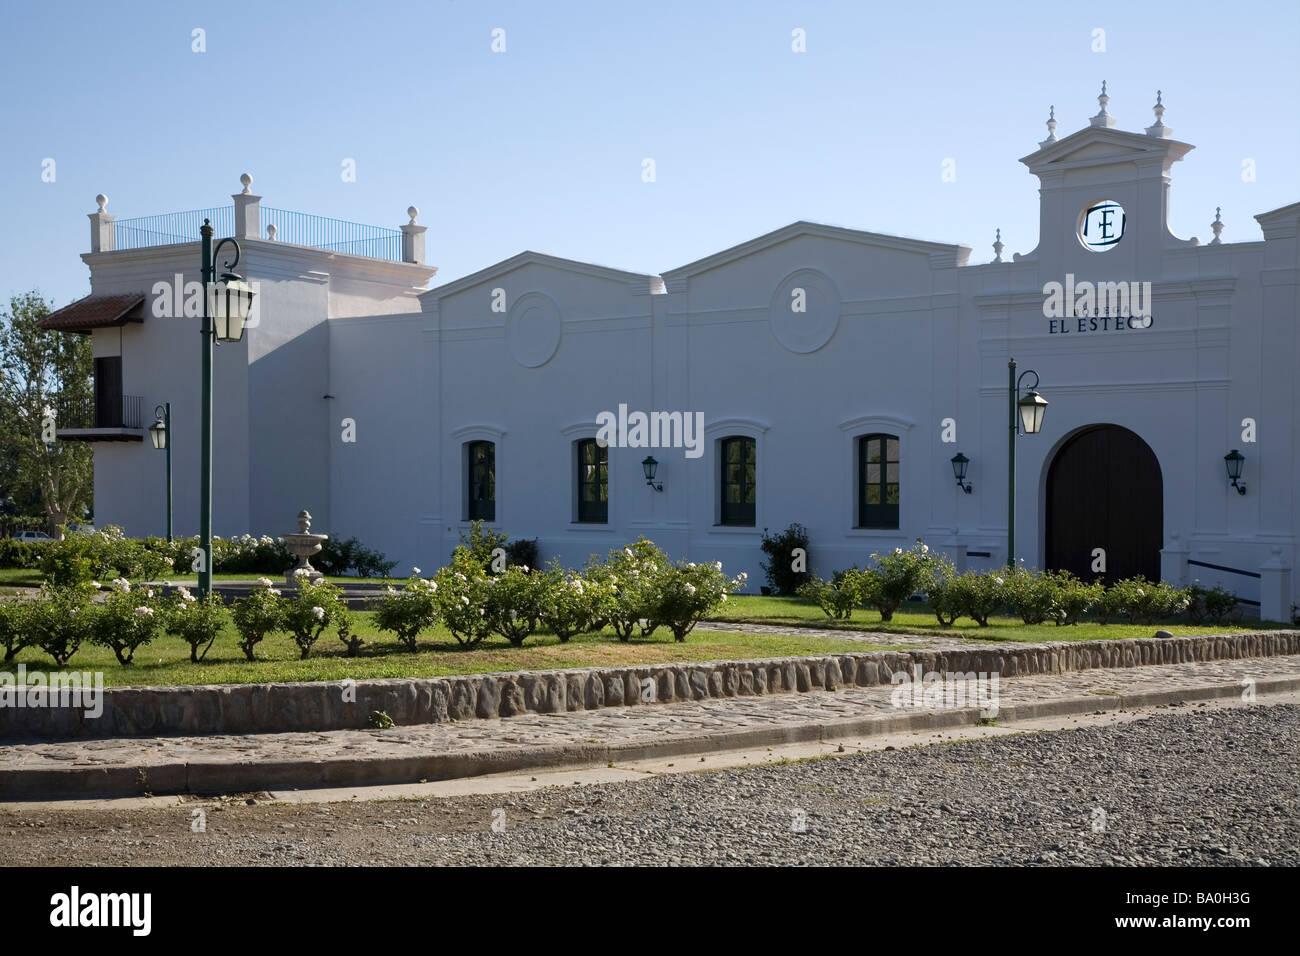 Entrance to Bodega El Esteco, Salta province, Argentina - Stock Image